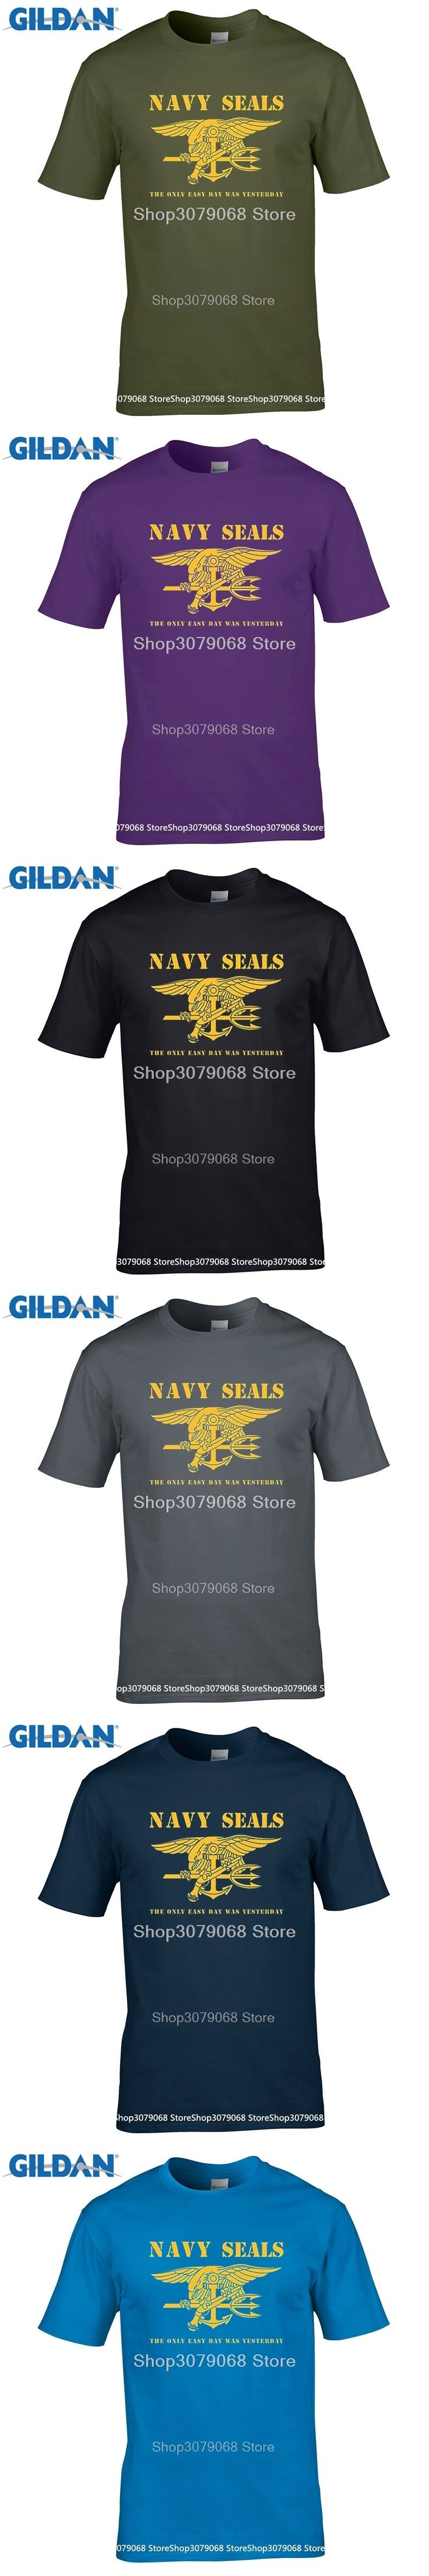 GILDAN t shirt design pattern Navy Seals Logo - The Only Easy Day Was Yesterday Premium   T-Shirt